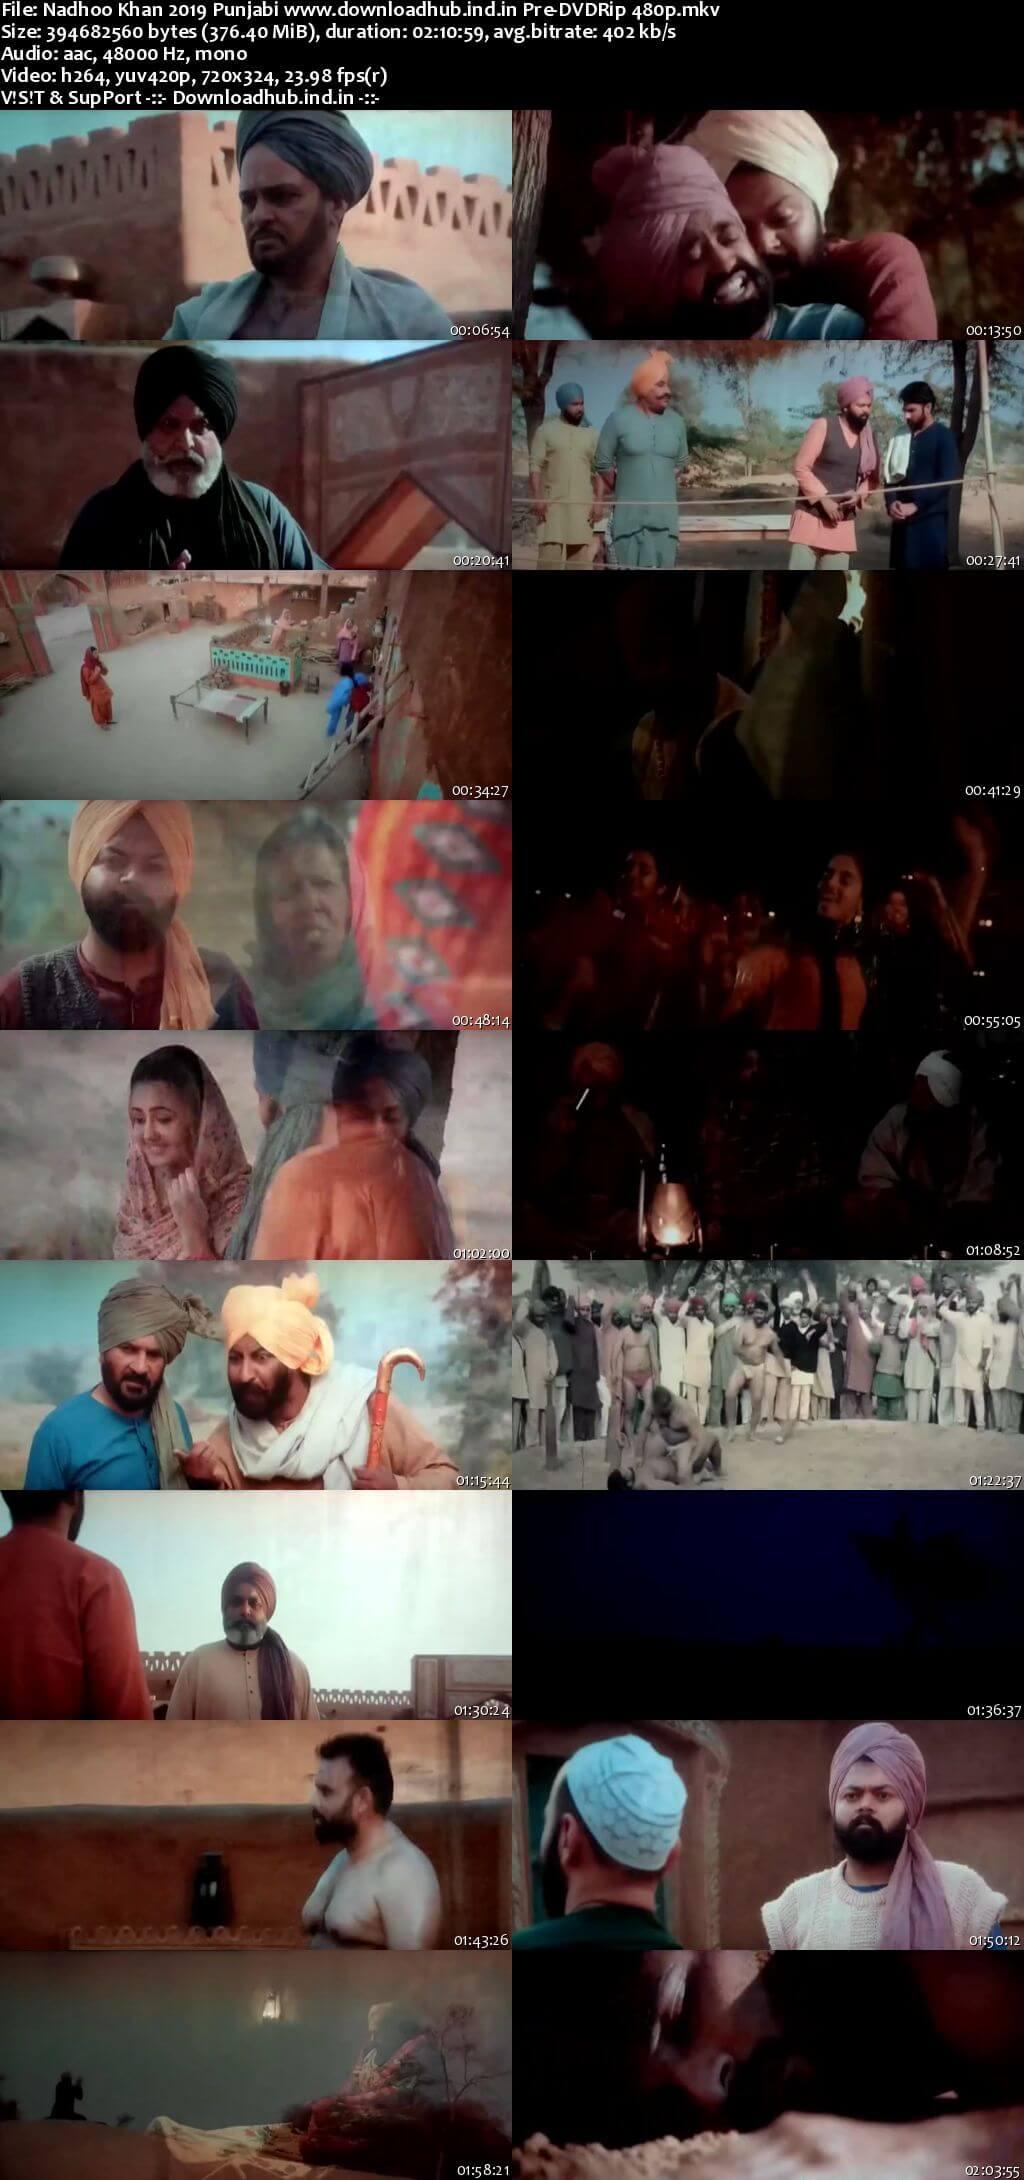 Nadhoo Khan 2019 Punjabi 350MB Pre-DVDRip 480p